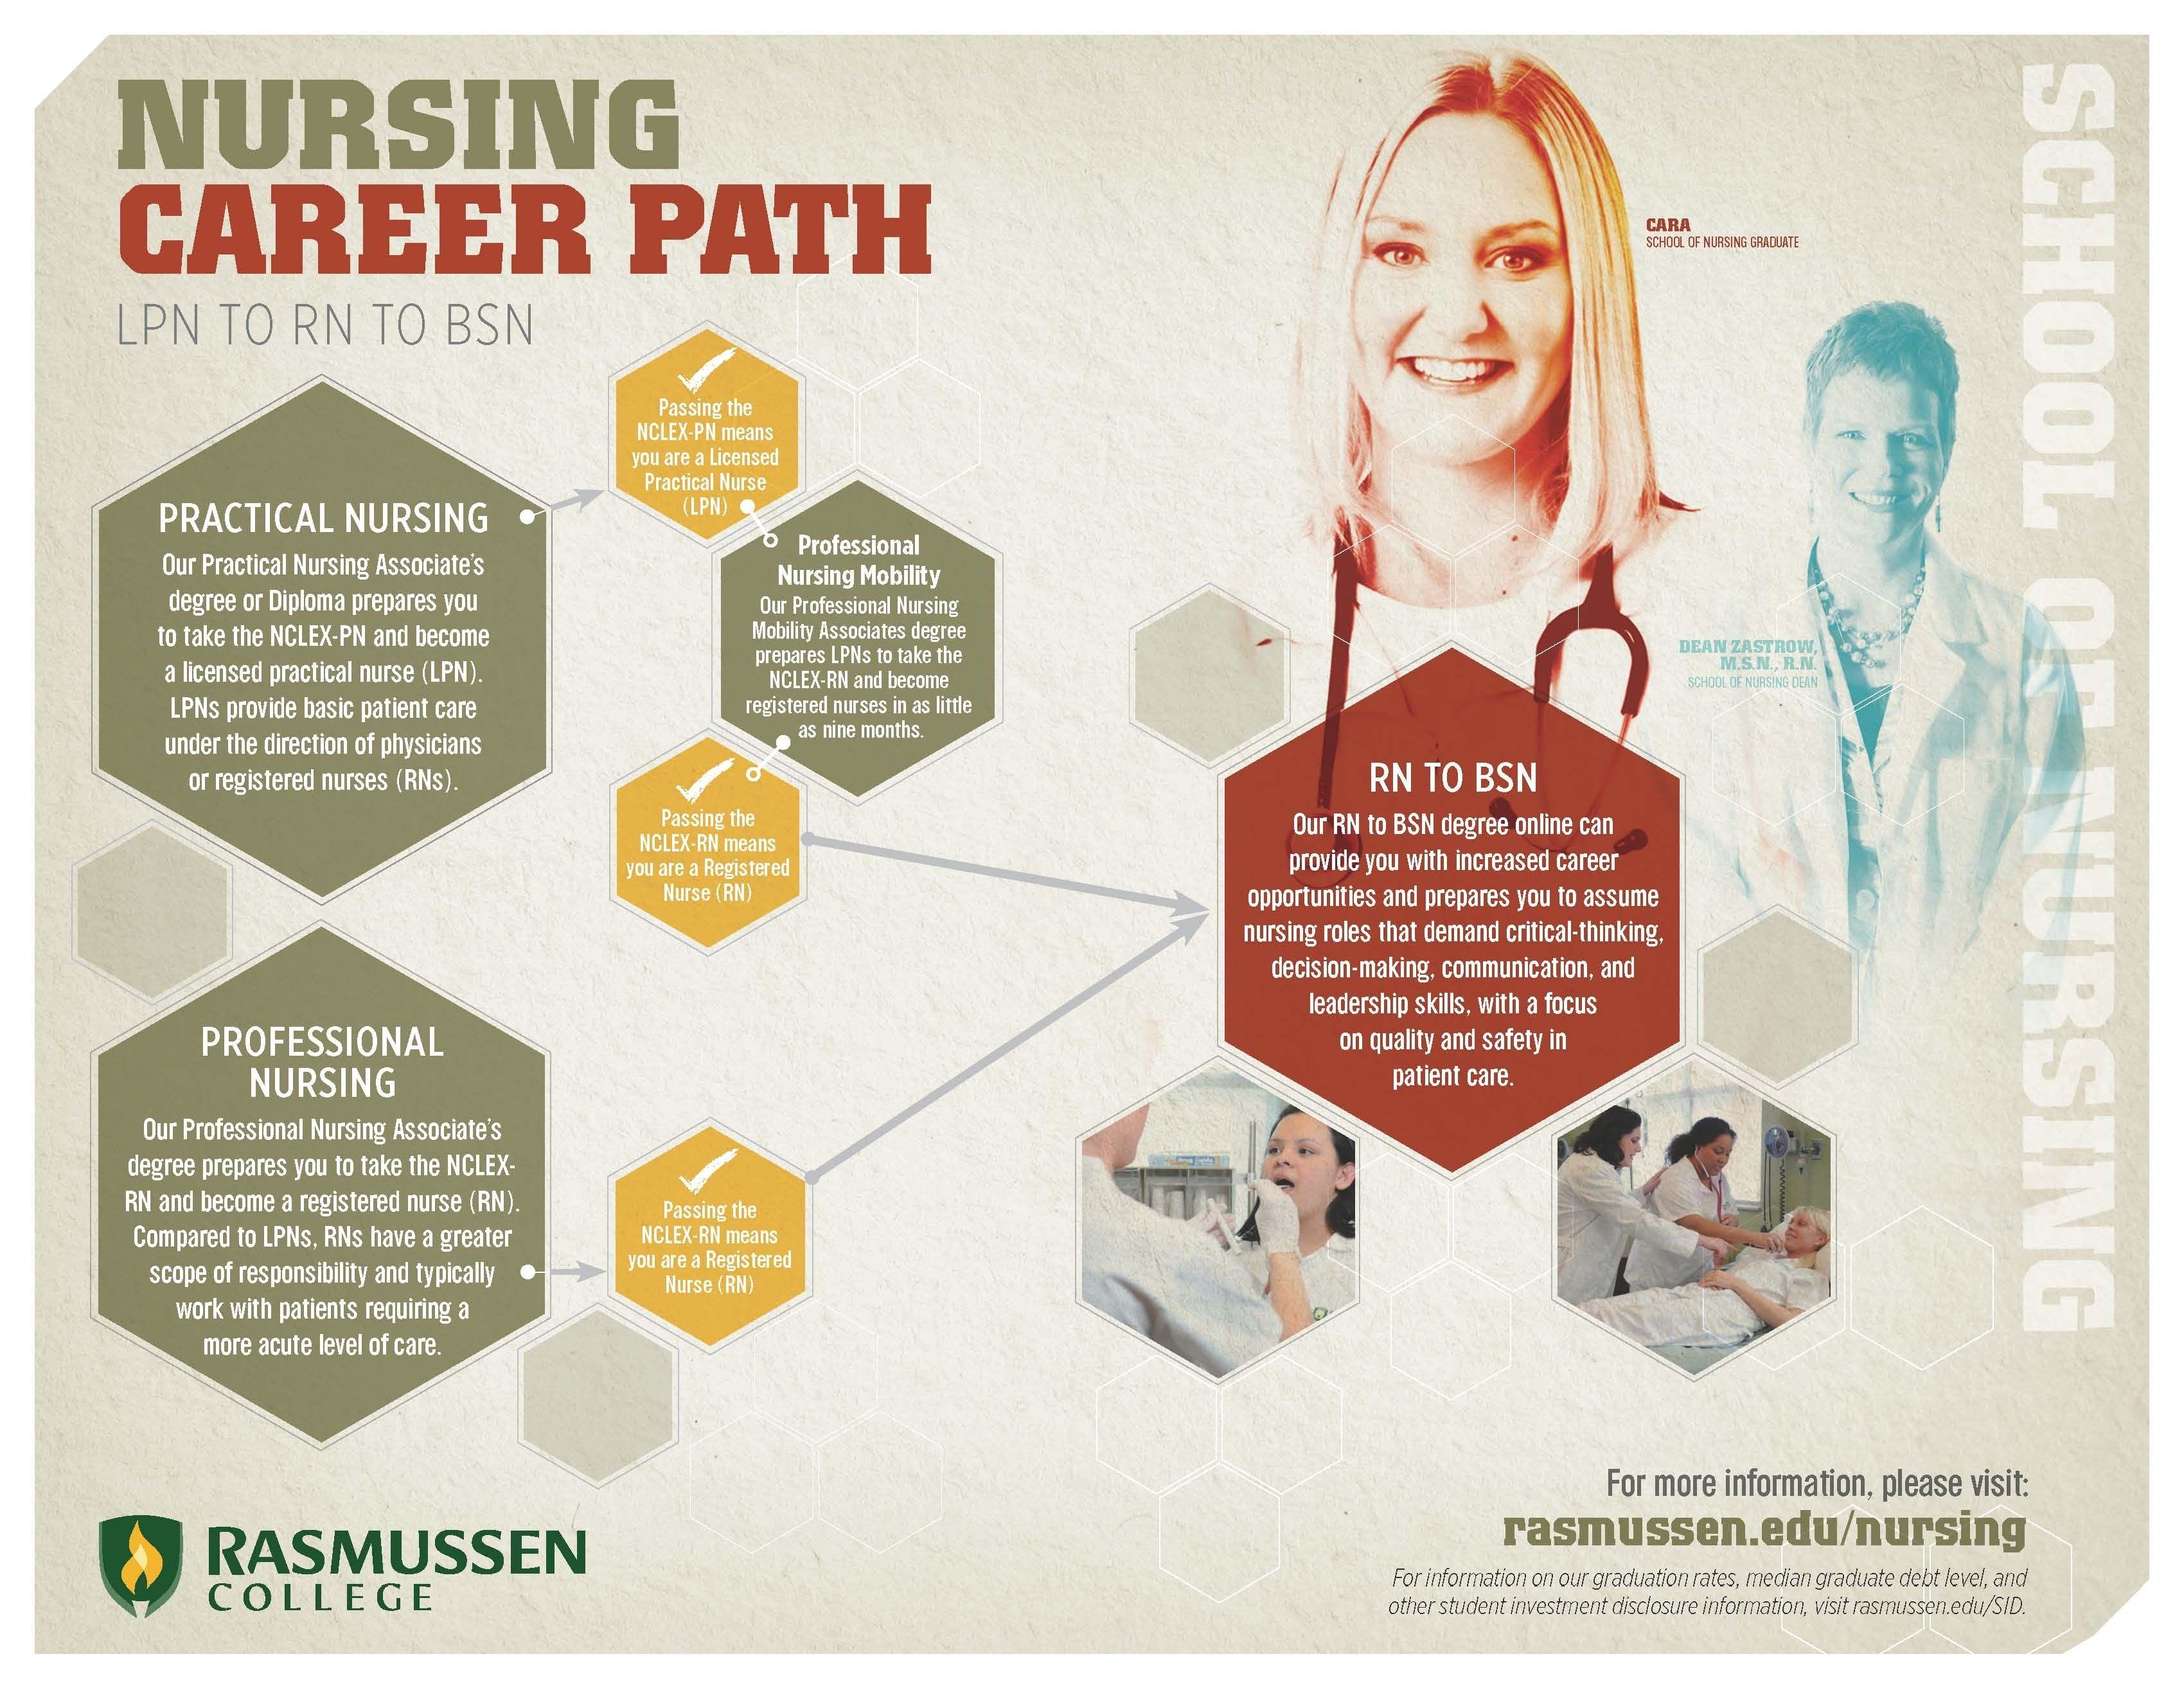 Nursing Career Path Nursing career paths, Nursing career